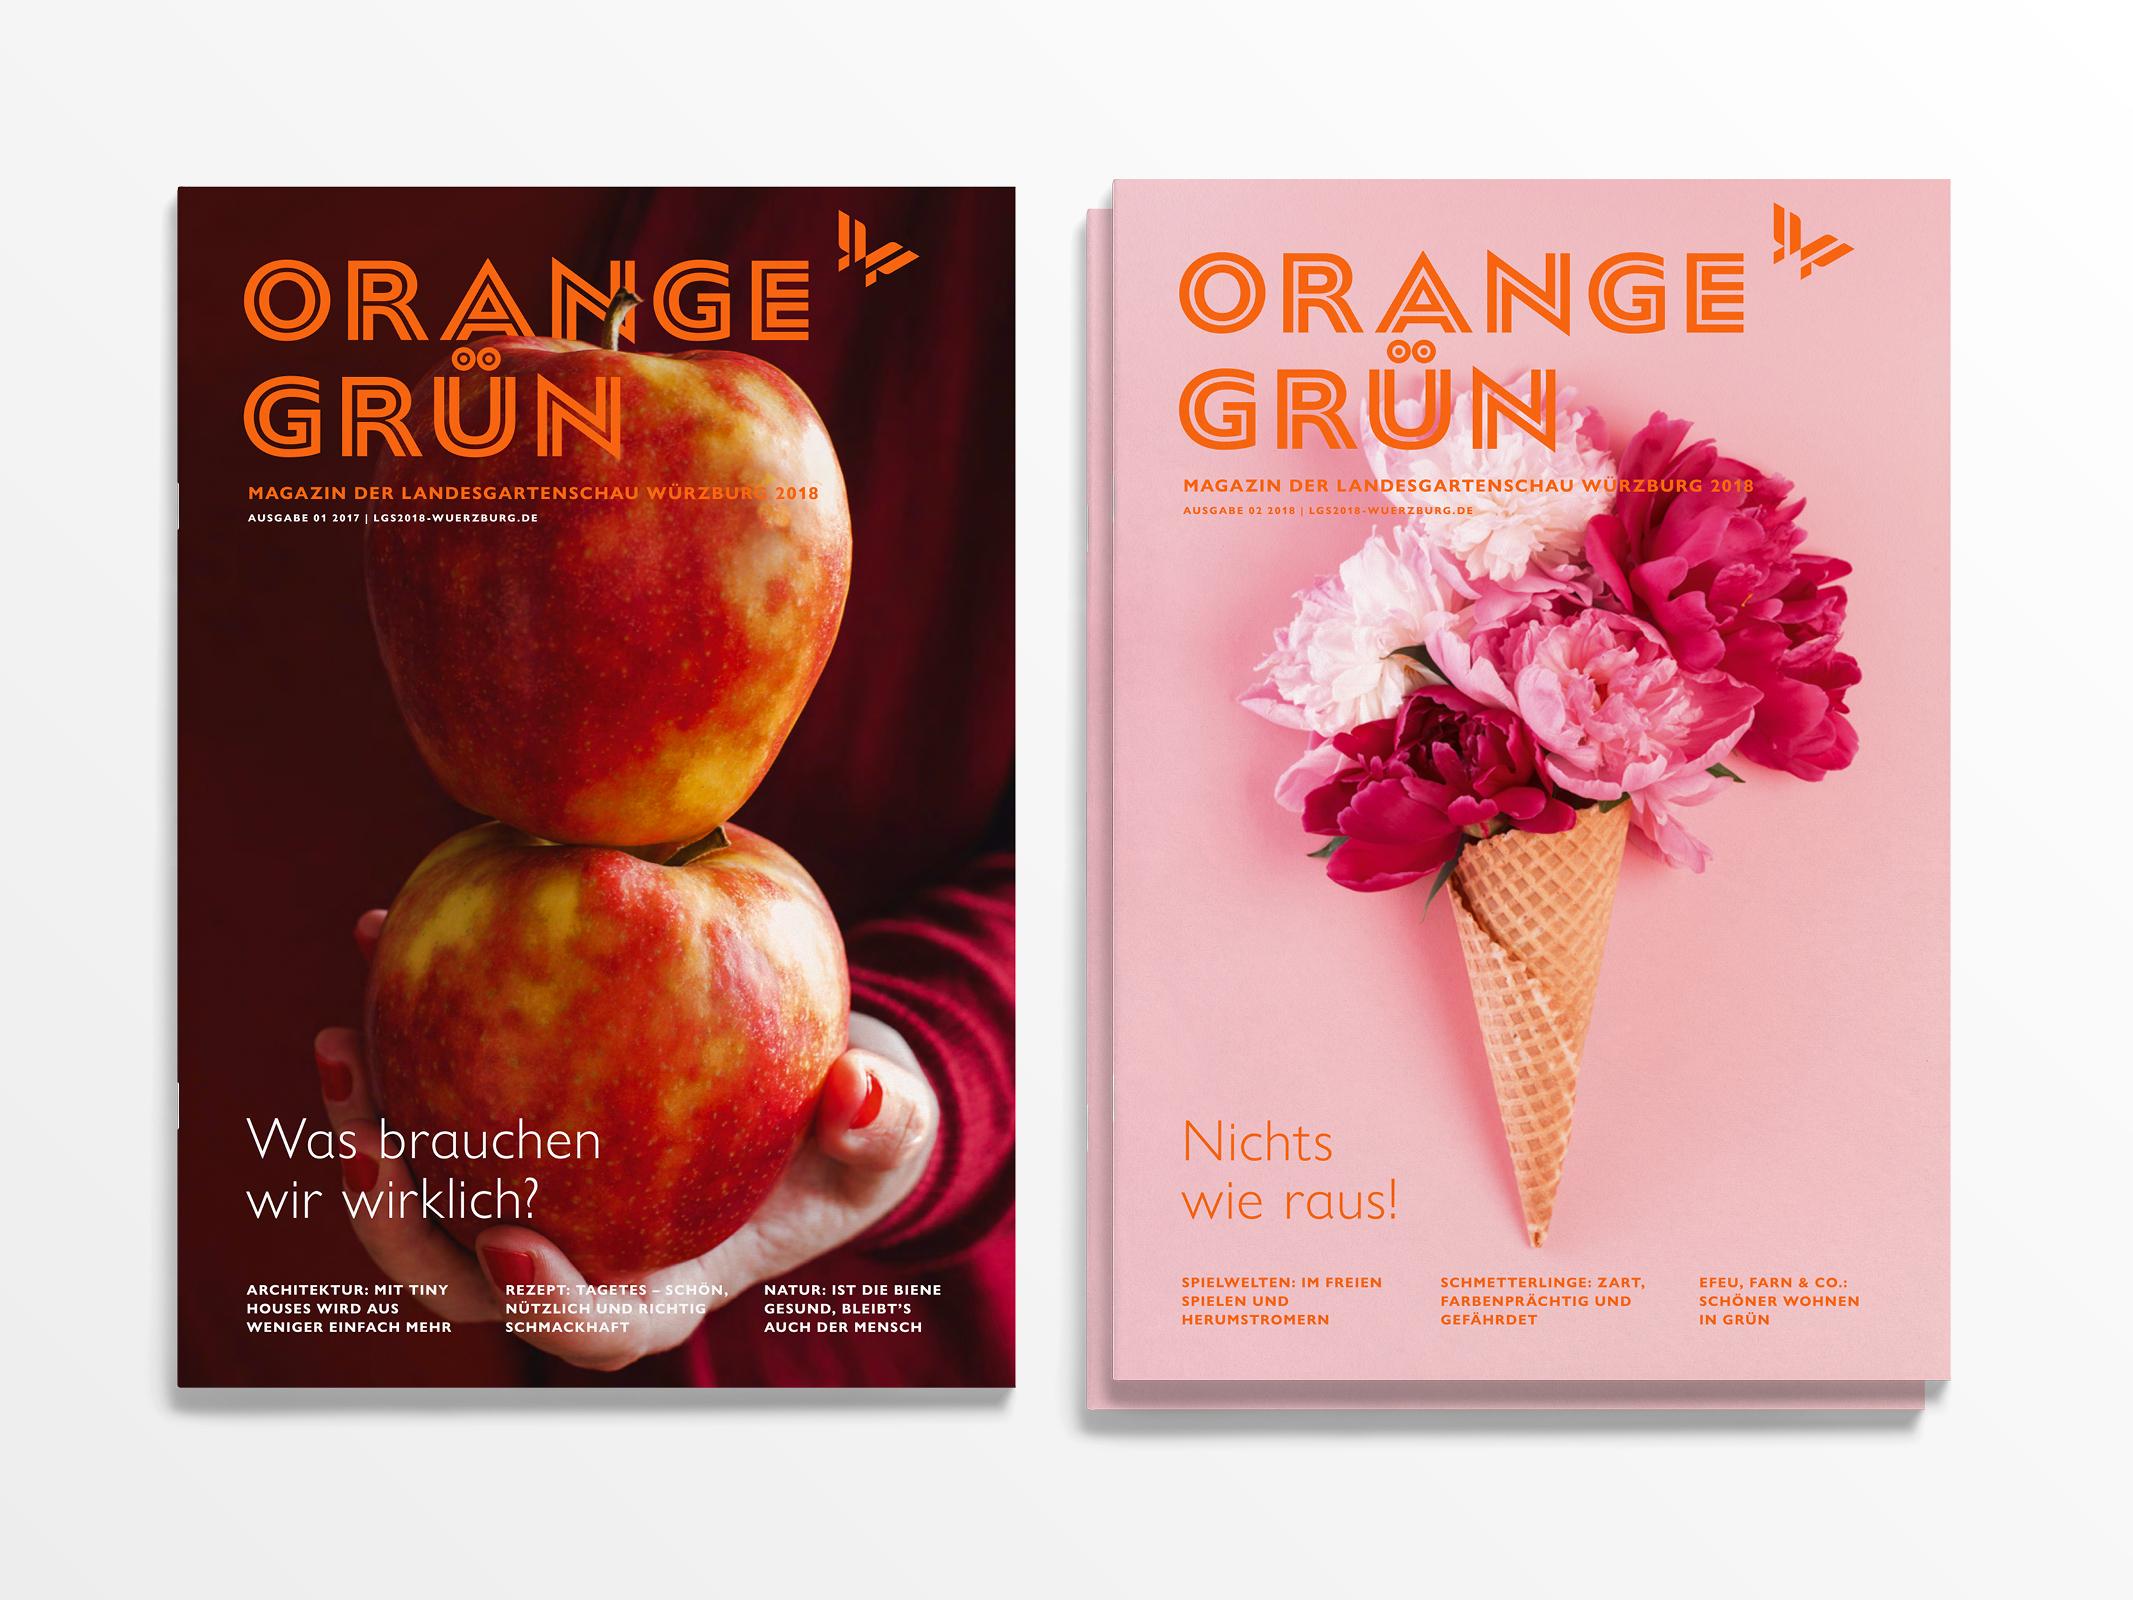 Orangegrün – Poarangan Brand Design